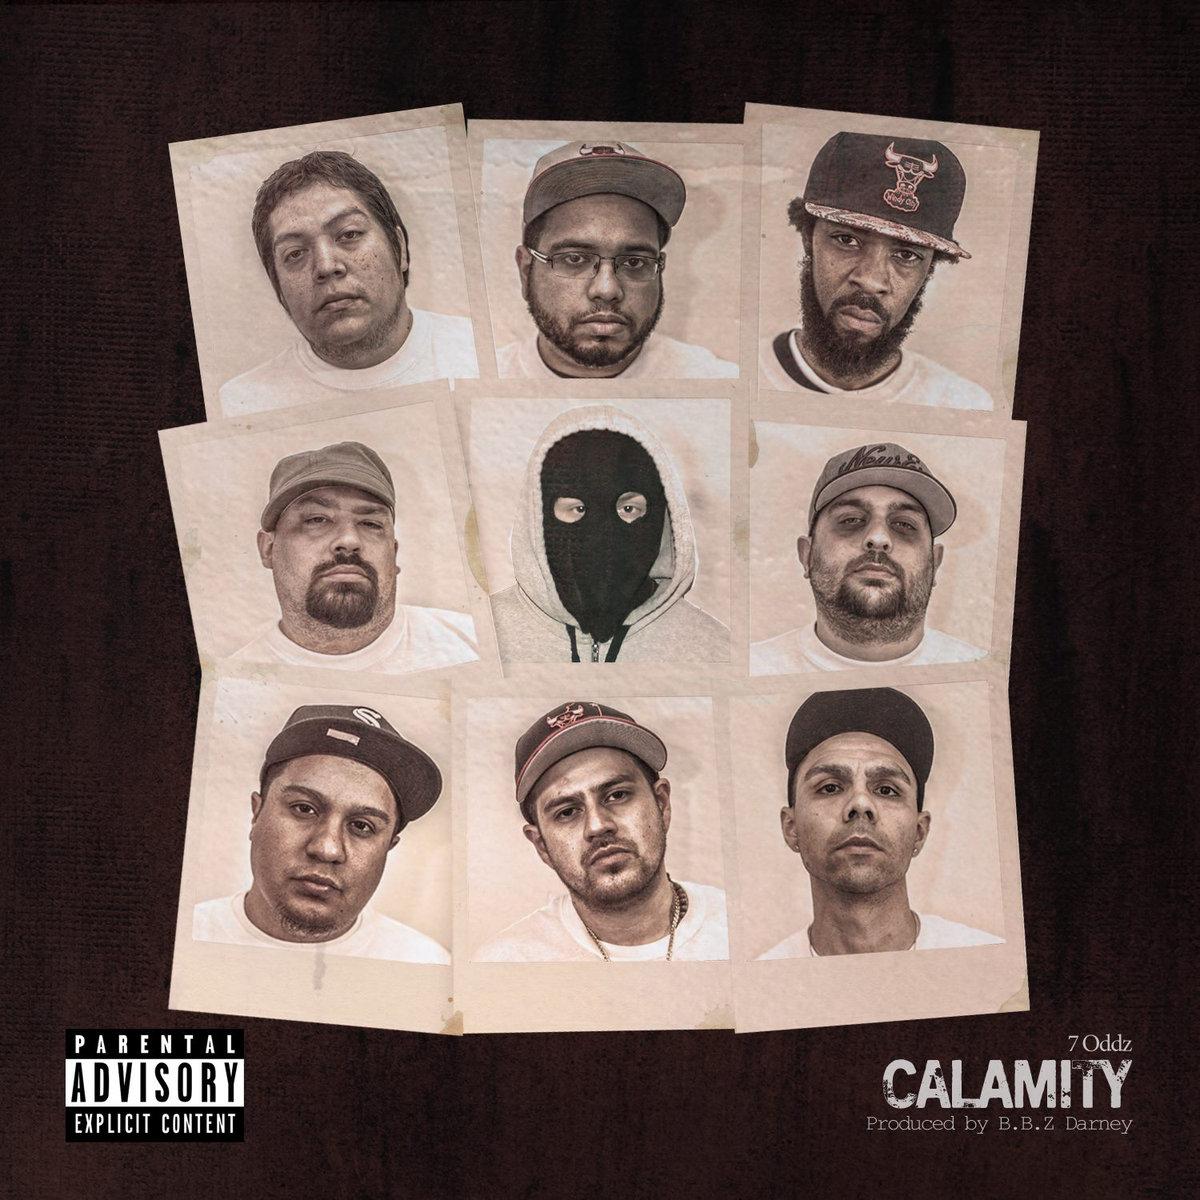 Seven_oddities_records_x_b.b.z._darney_presentan_calamity